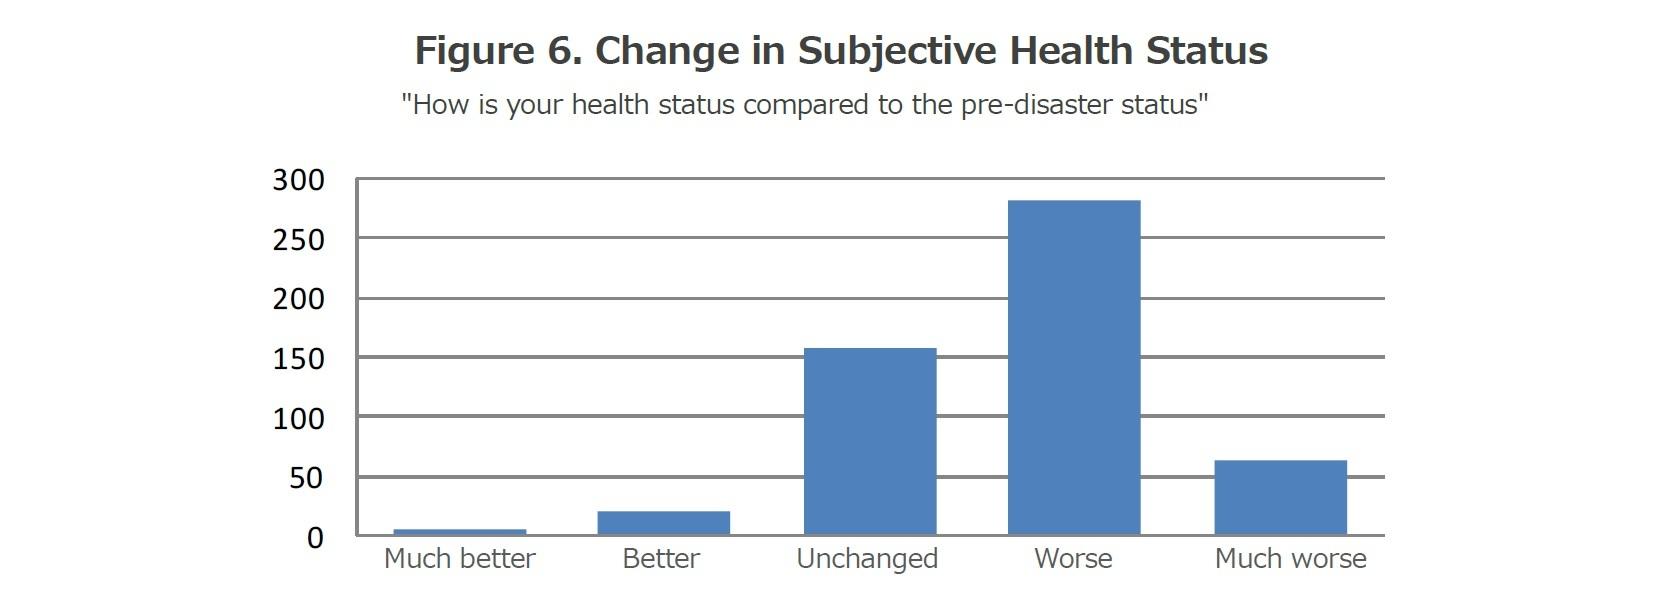 Figure 6. Change in Subjective Health Status